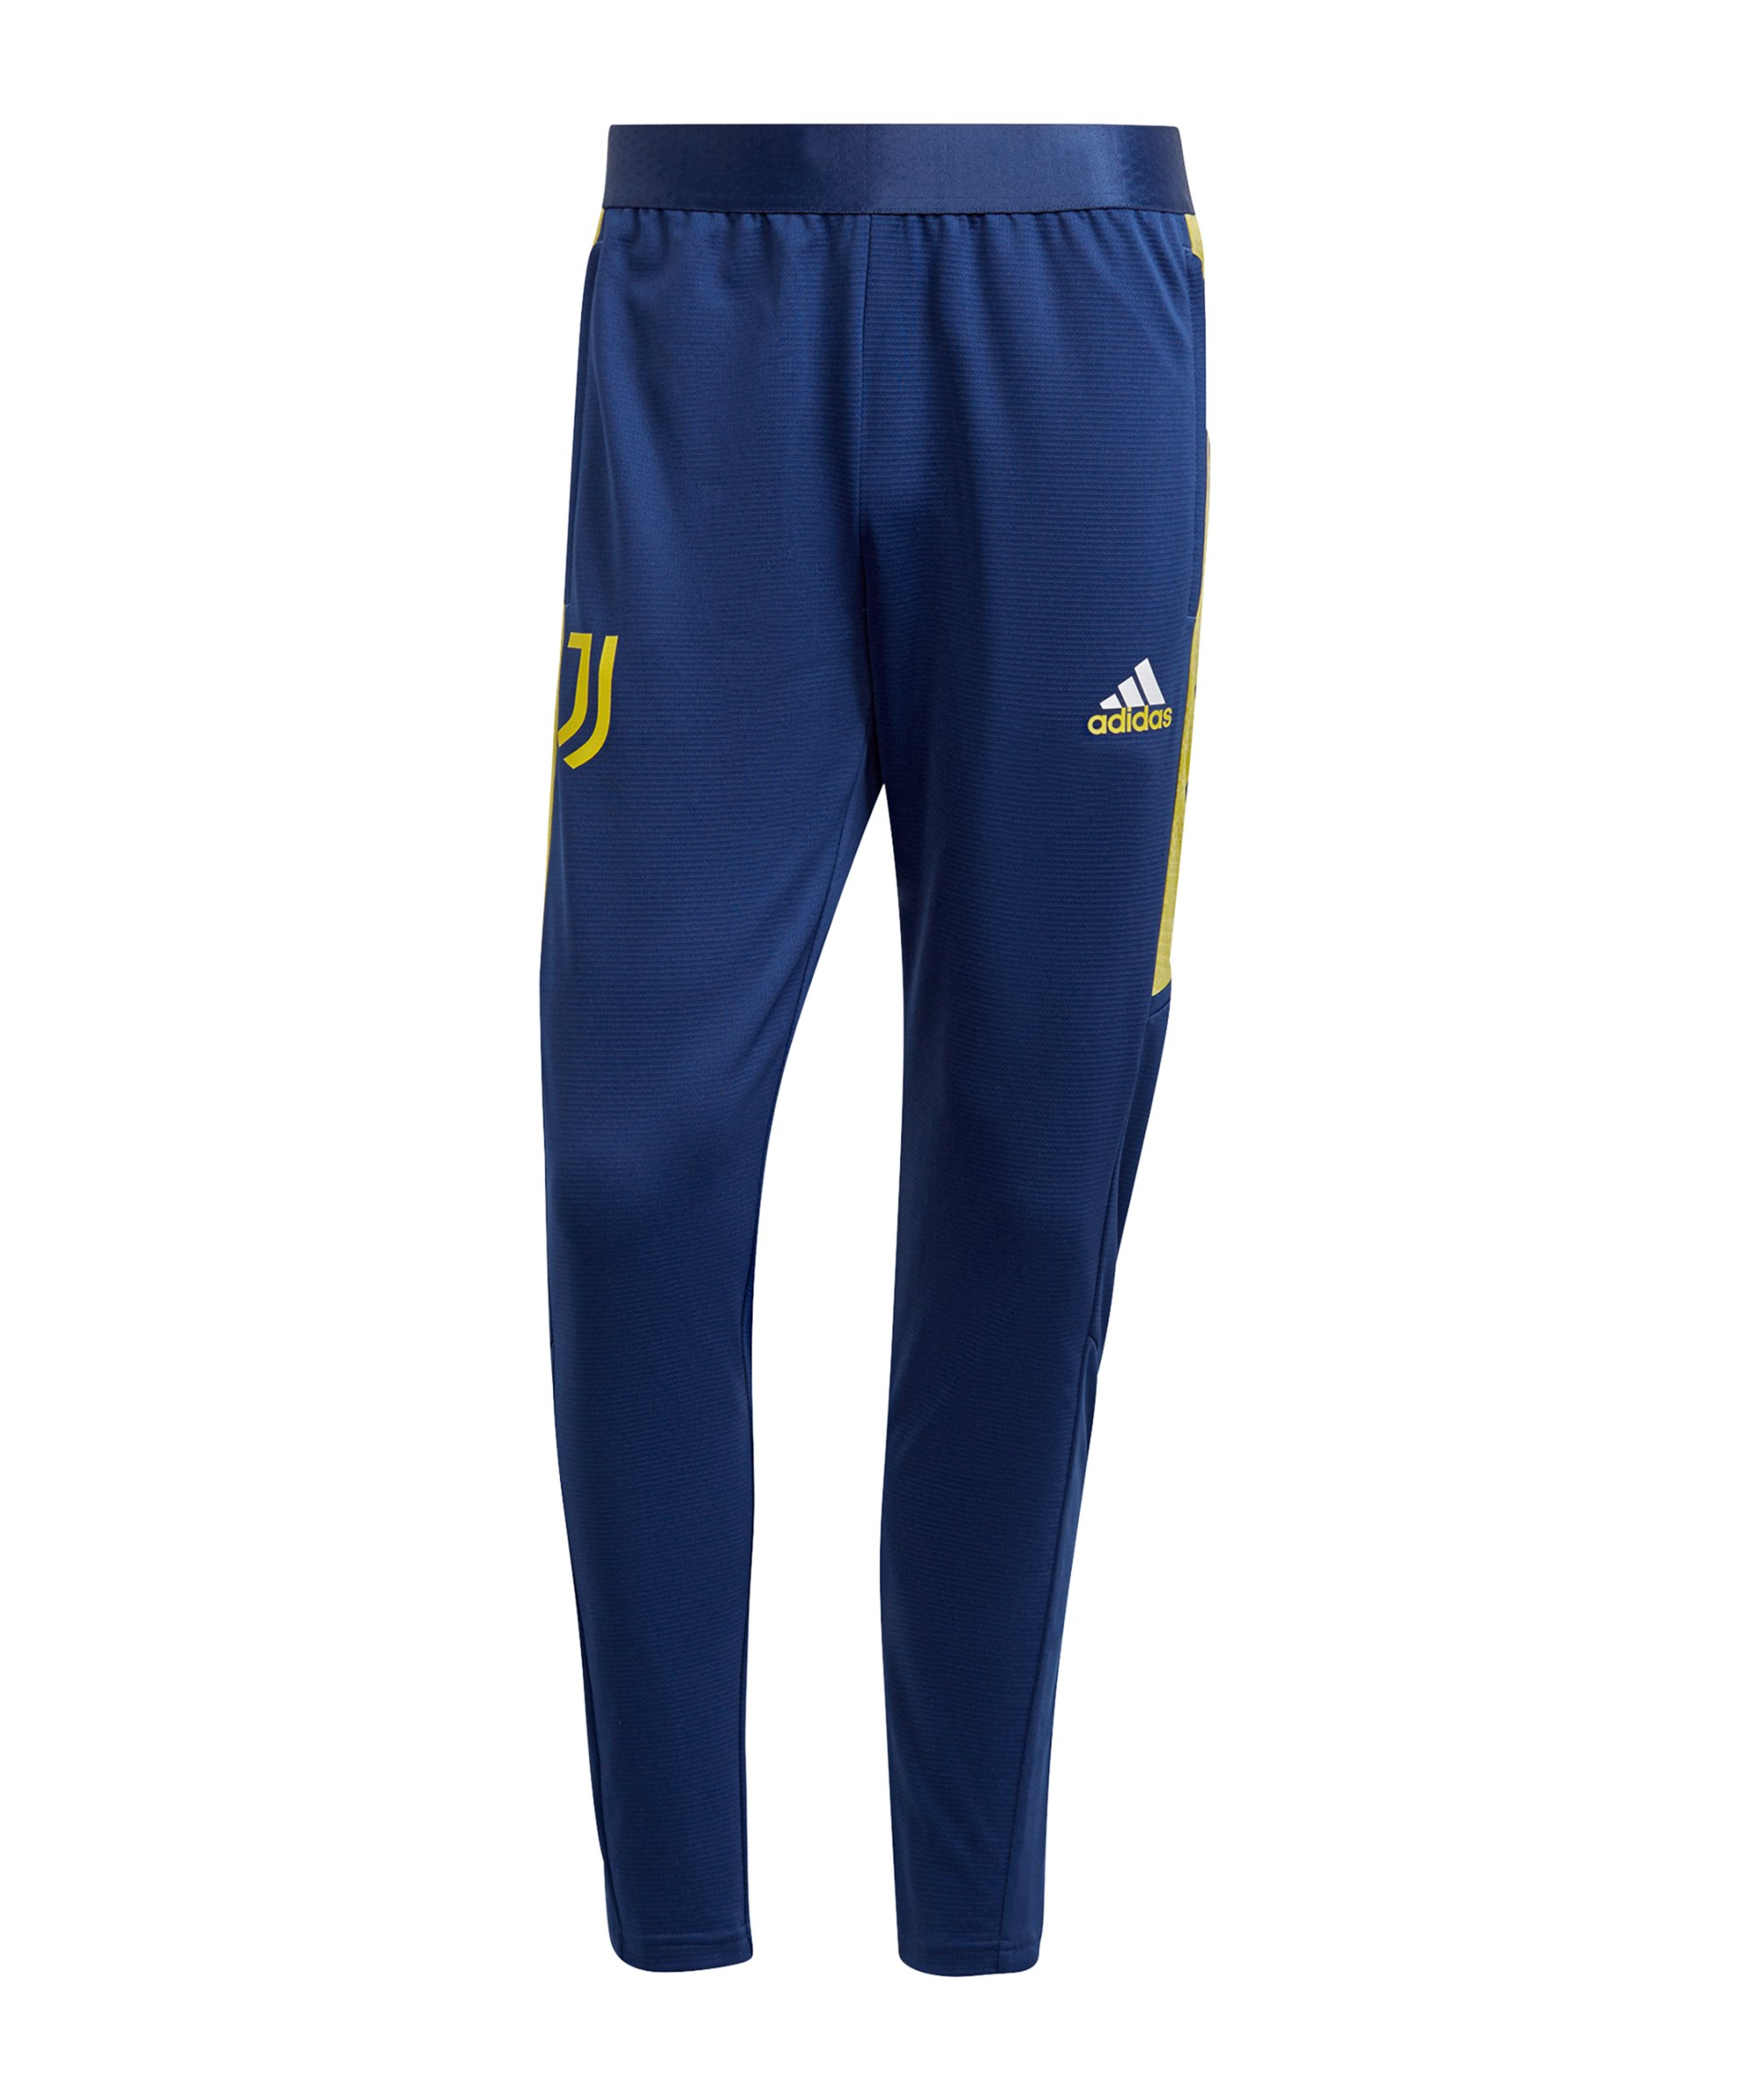 adidas Juventus Turin Trainingshose Blau Gelb - gelb